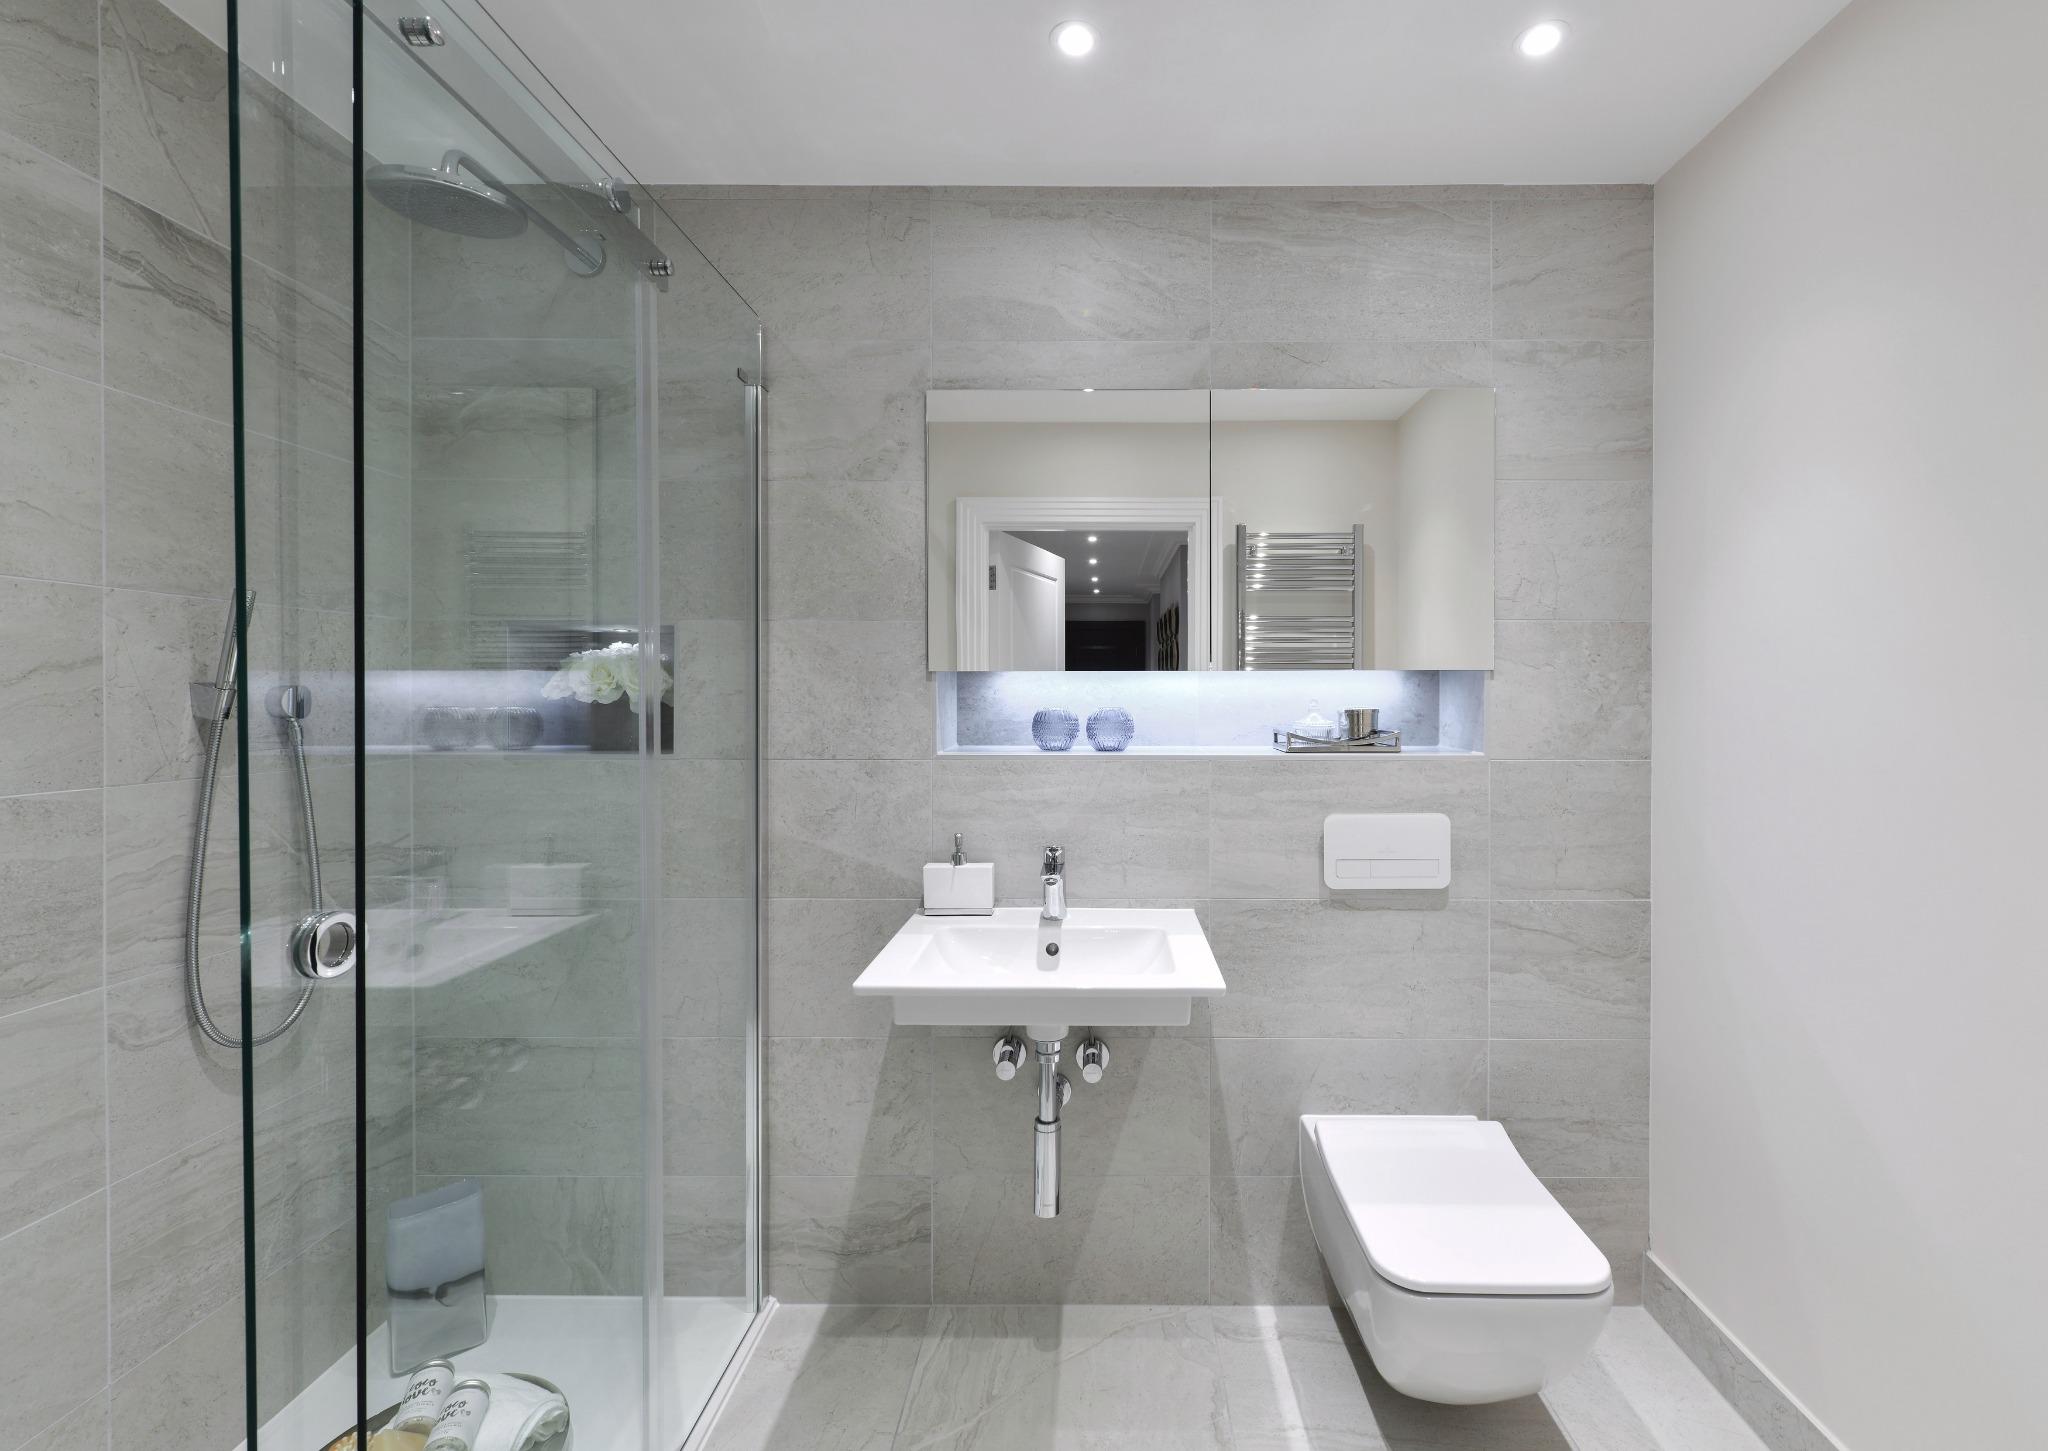 Taplow Riverside,Bathroom